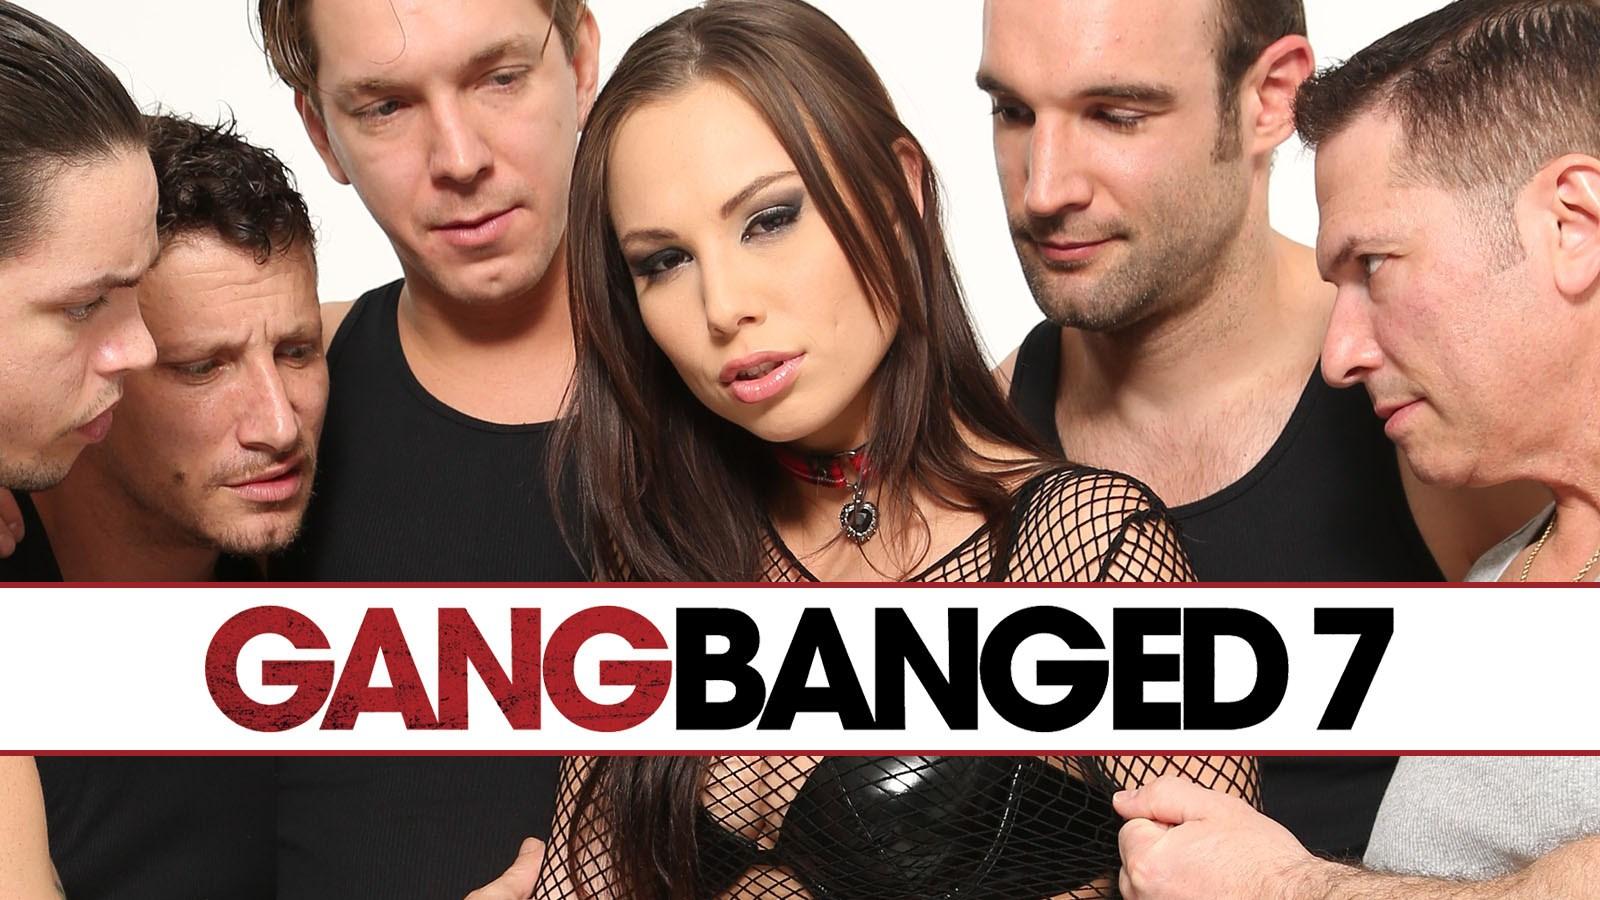 Gangbanged #7 (2016) Dvd